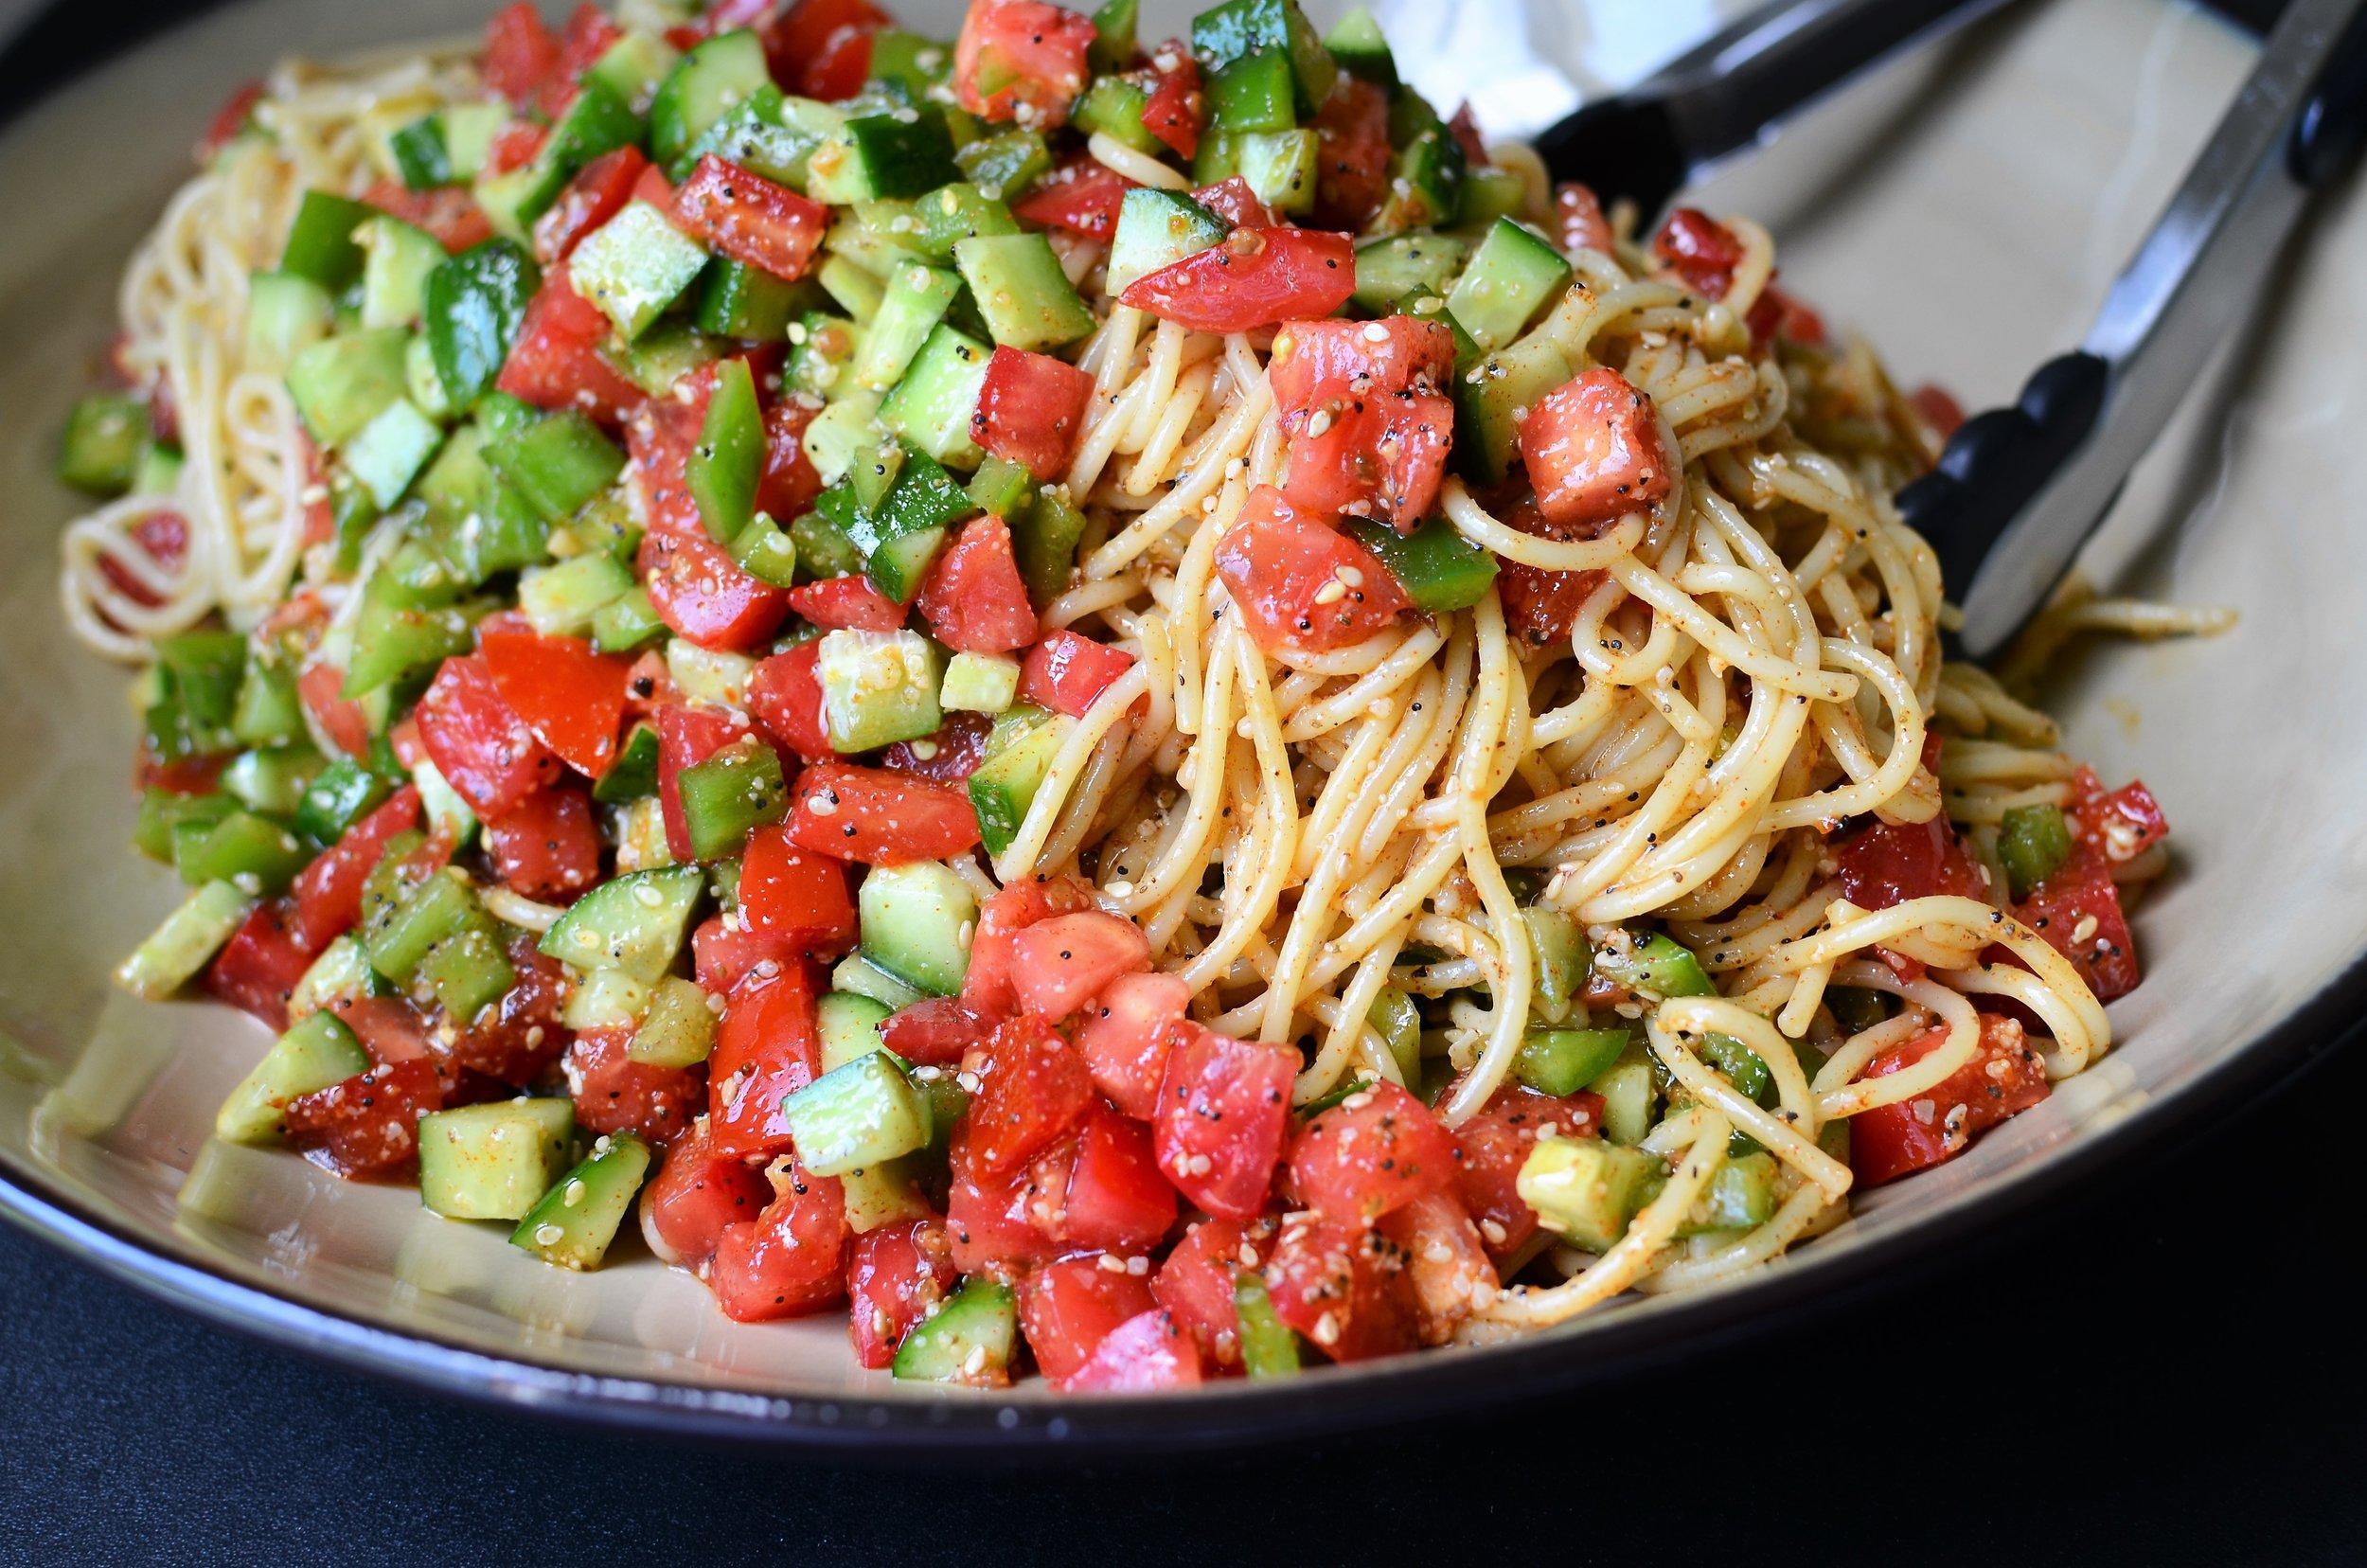 Copycat Supreme Pasta Salad Butteryum A Tasty Little